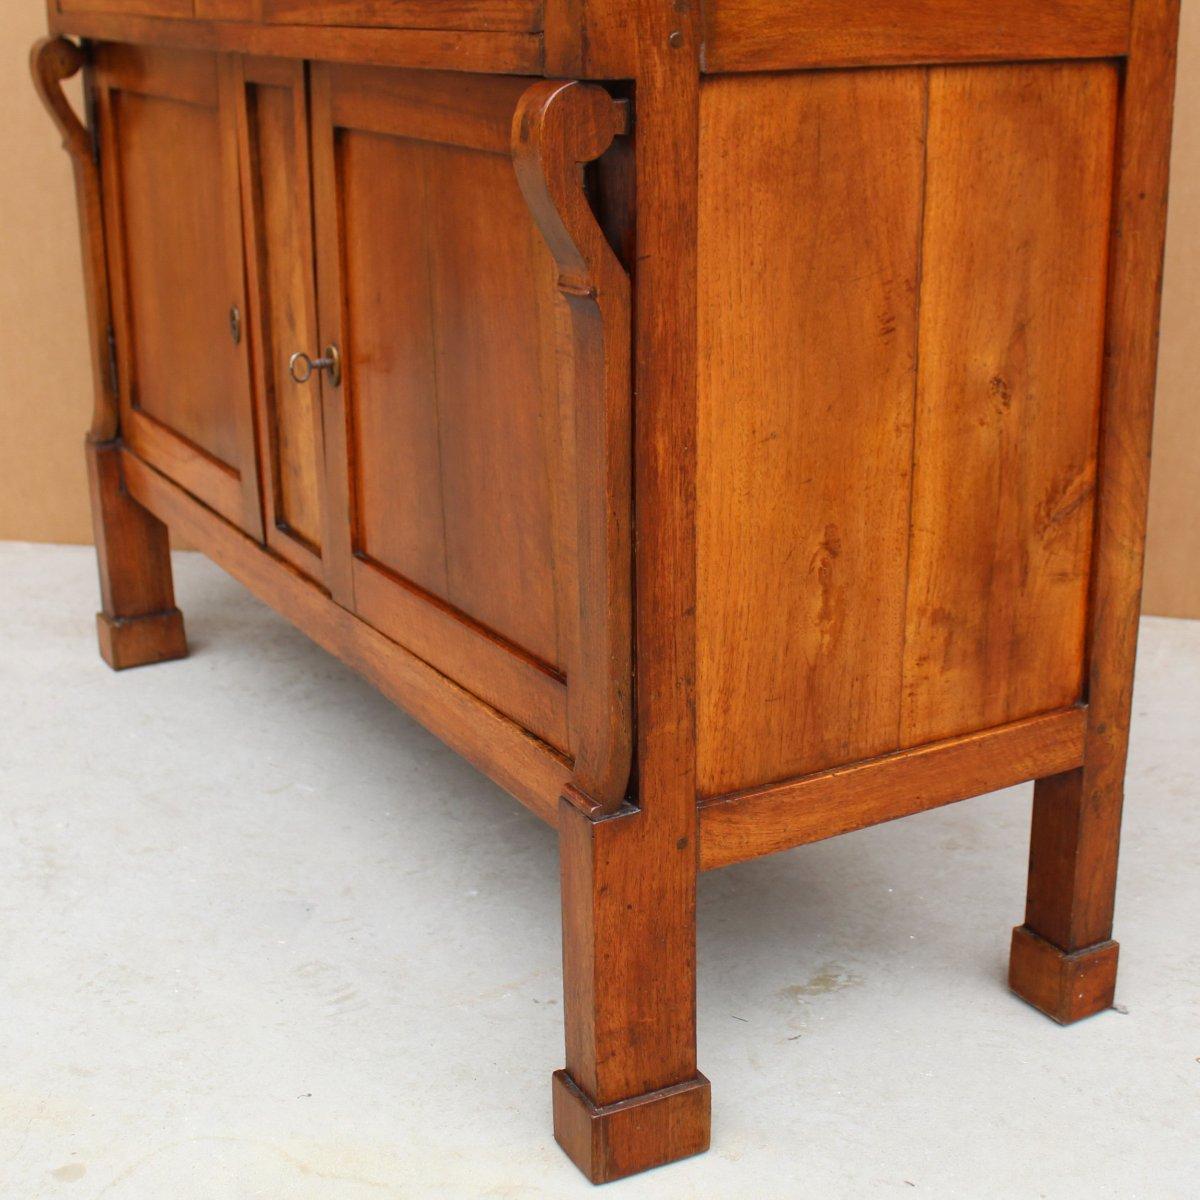 Antique Empire Sideboard Dresser Cabinet Cupboard Buffet In Walnut - Italy 19th-photo-6